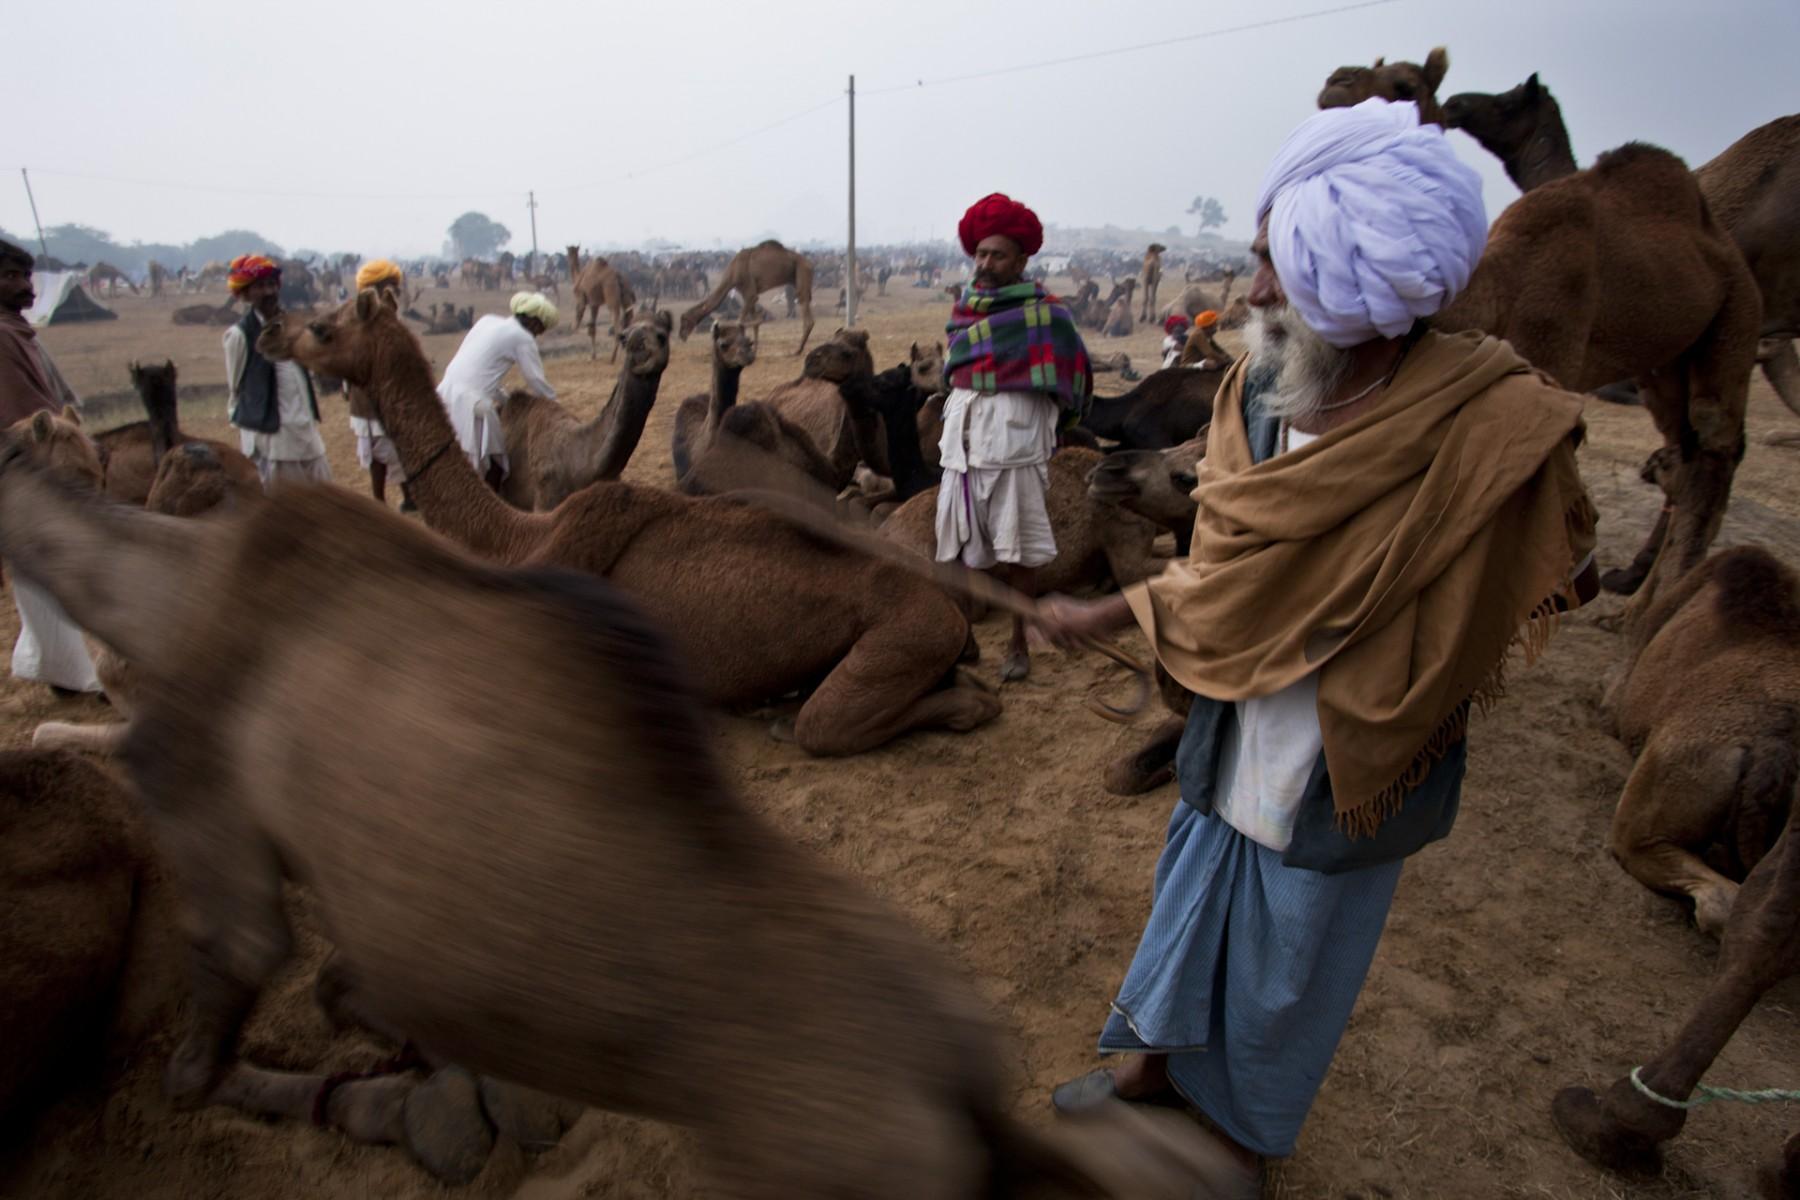 Inspecting the camels at Pushkar